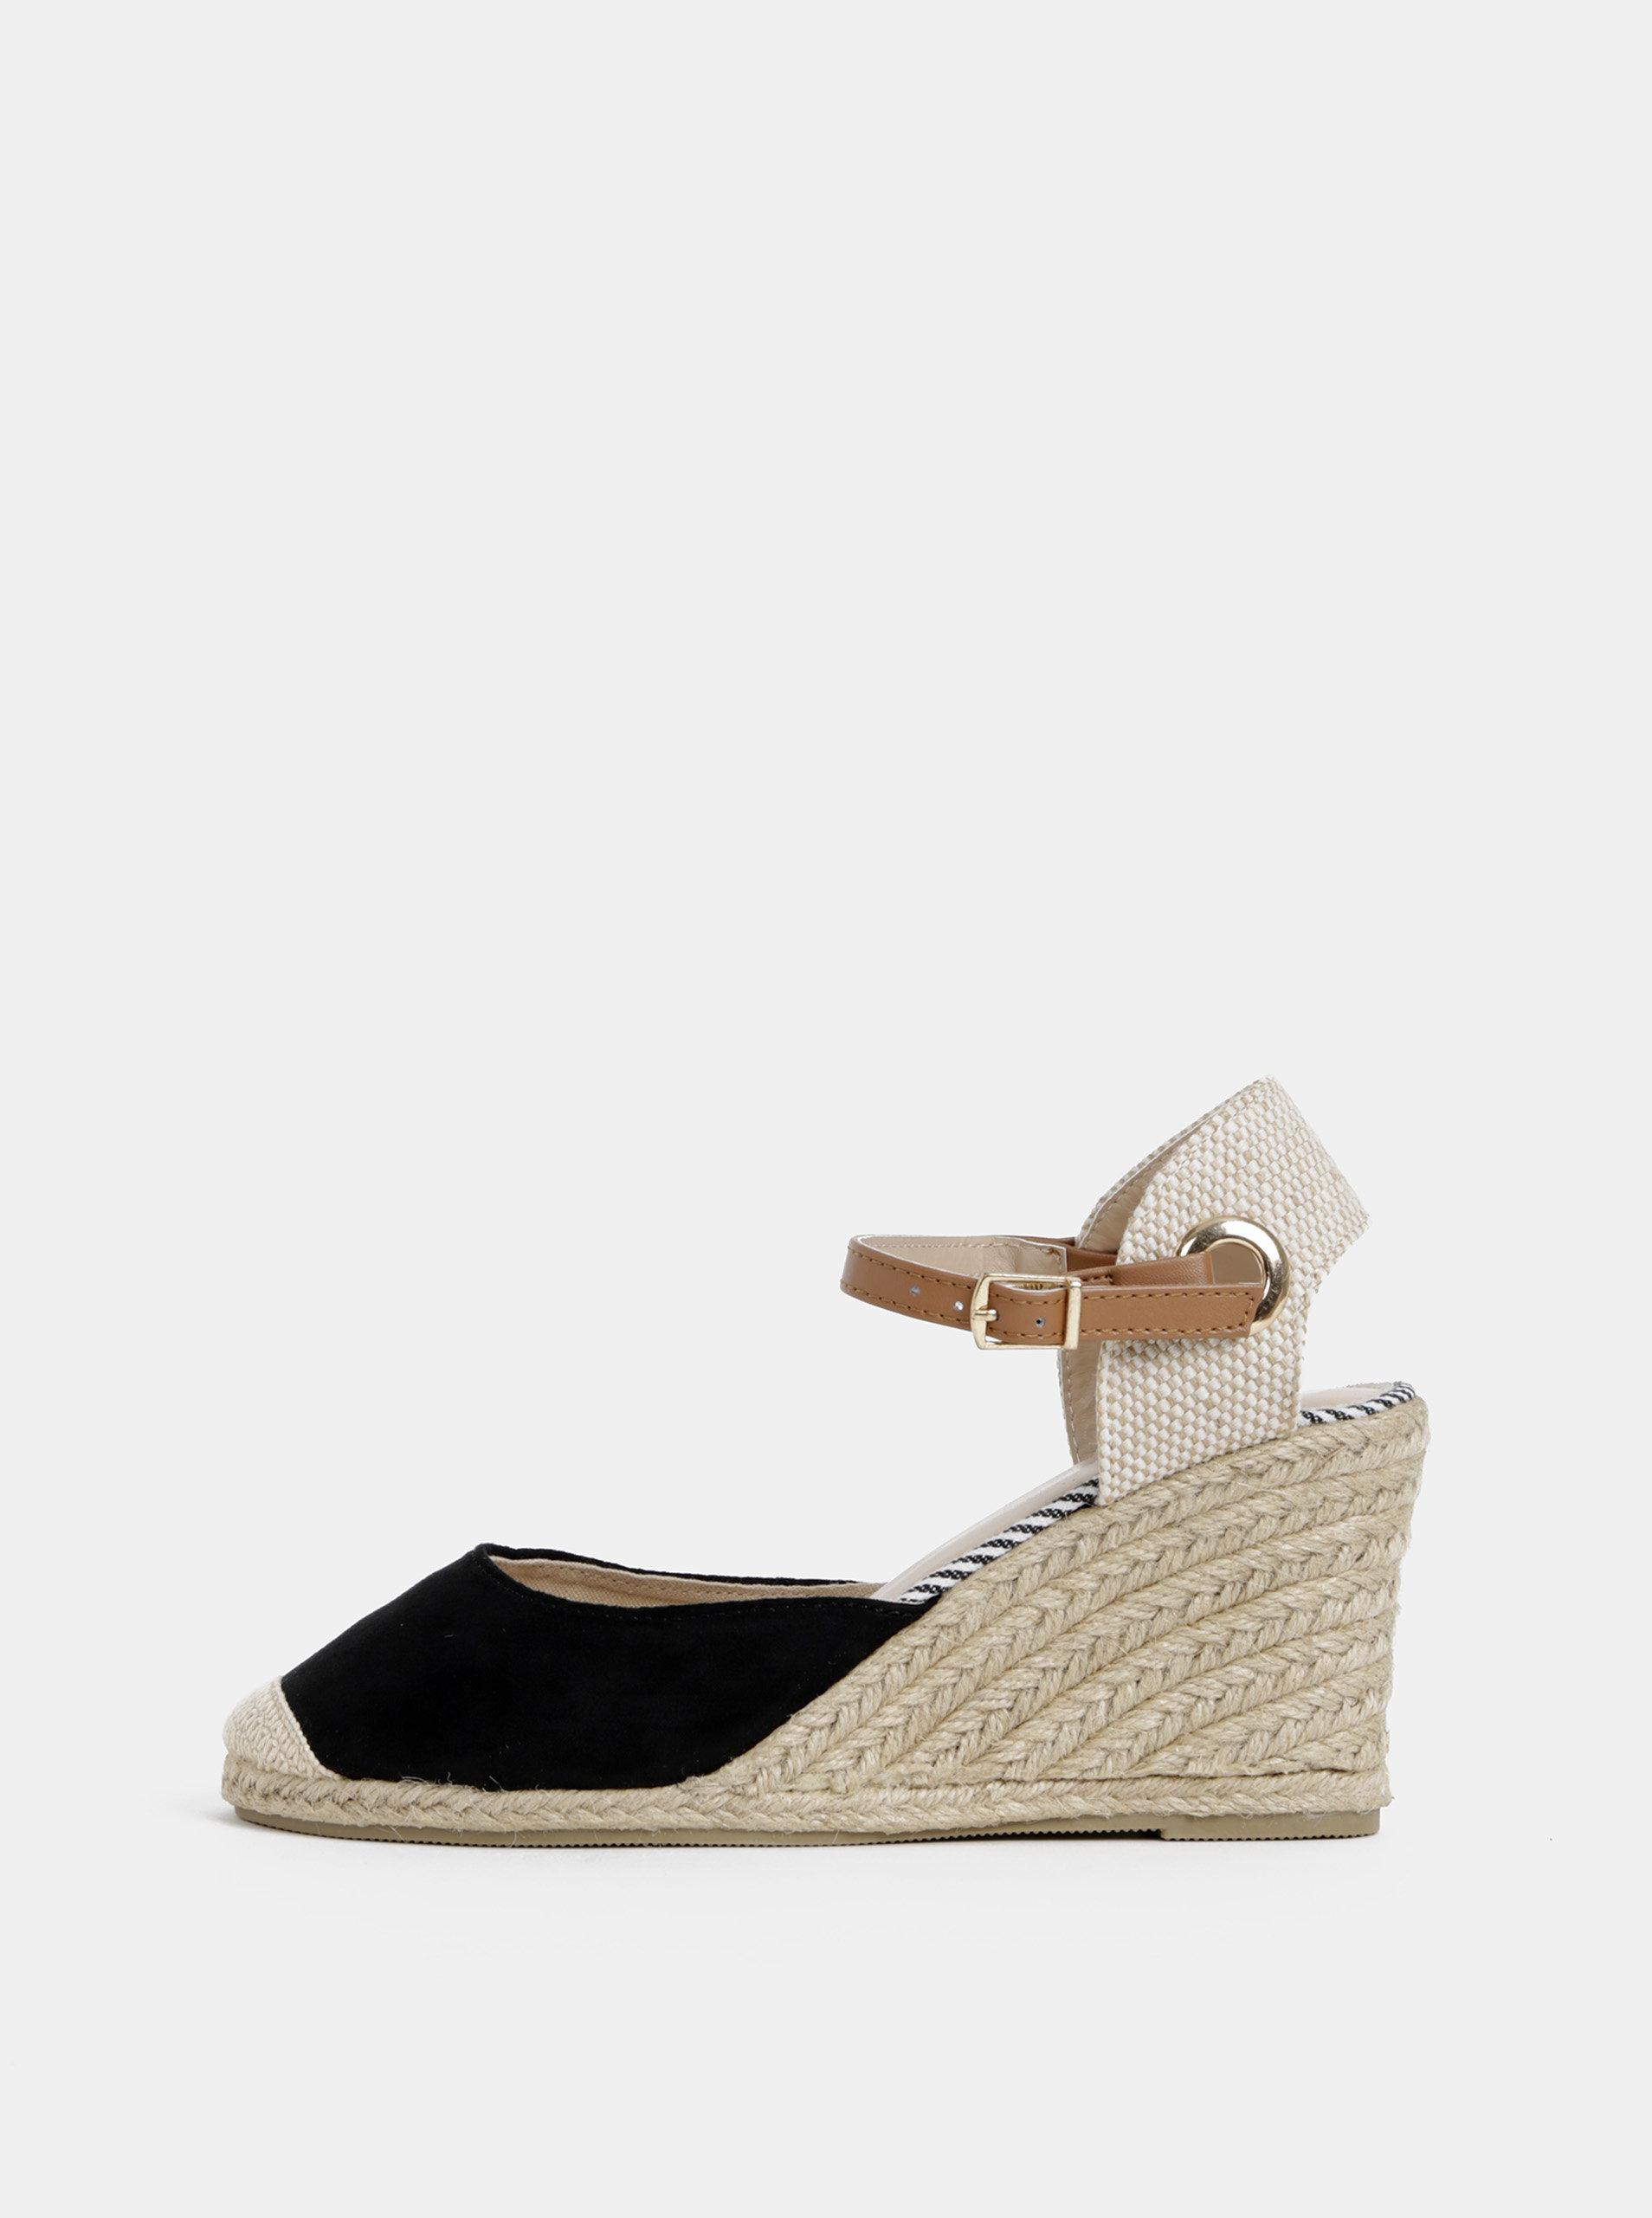 d4bff8c51fed Čierne sandále na plnom podpätku Dorothy Perkins ...